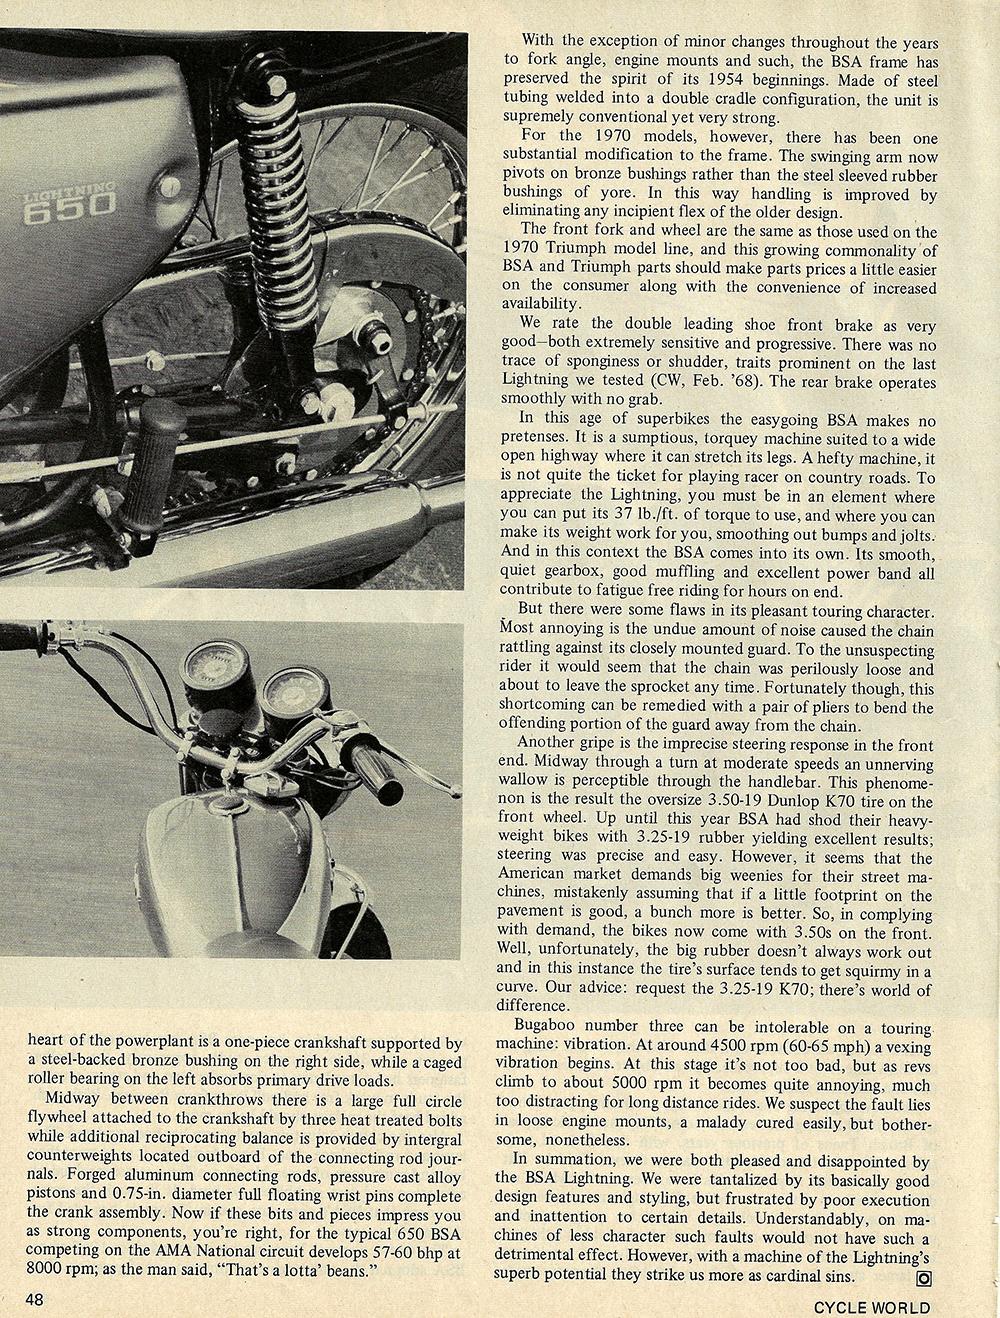 1970 BSA 650 Lightning road test 04.jpg